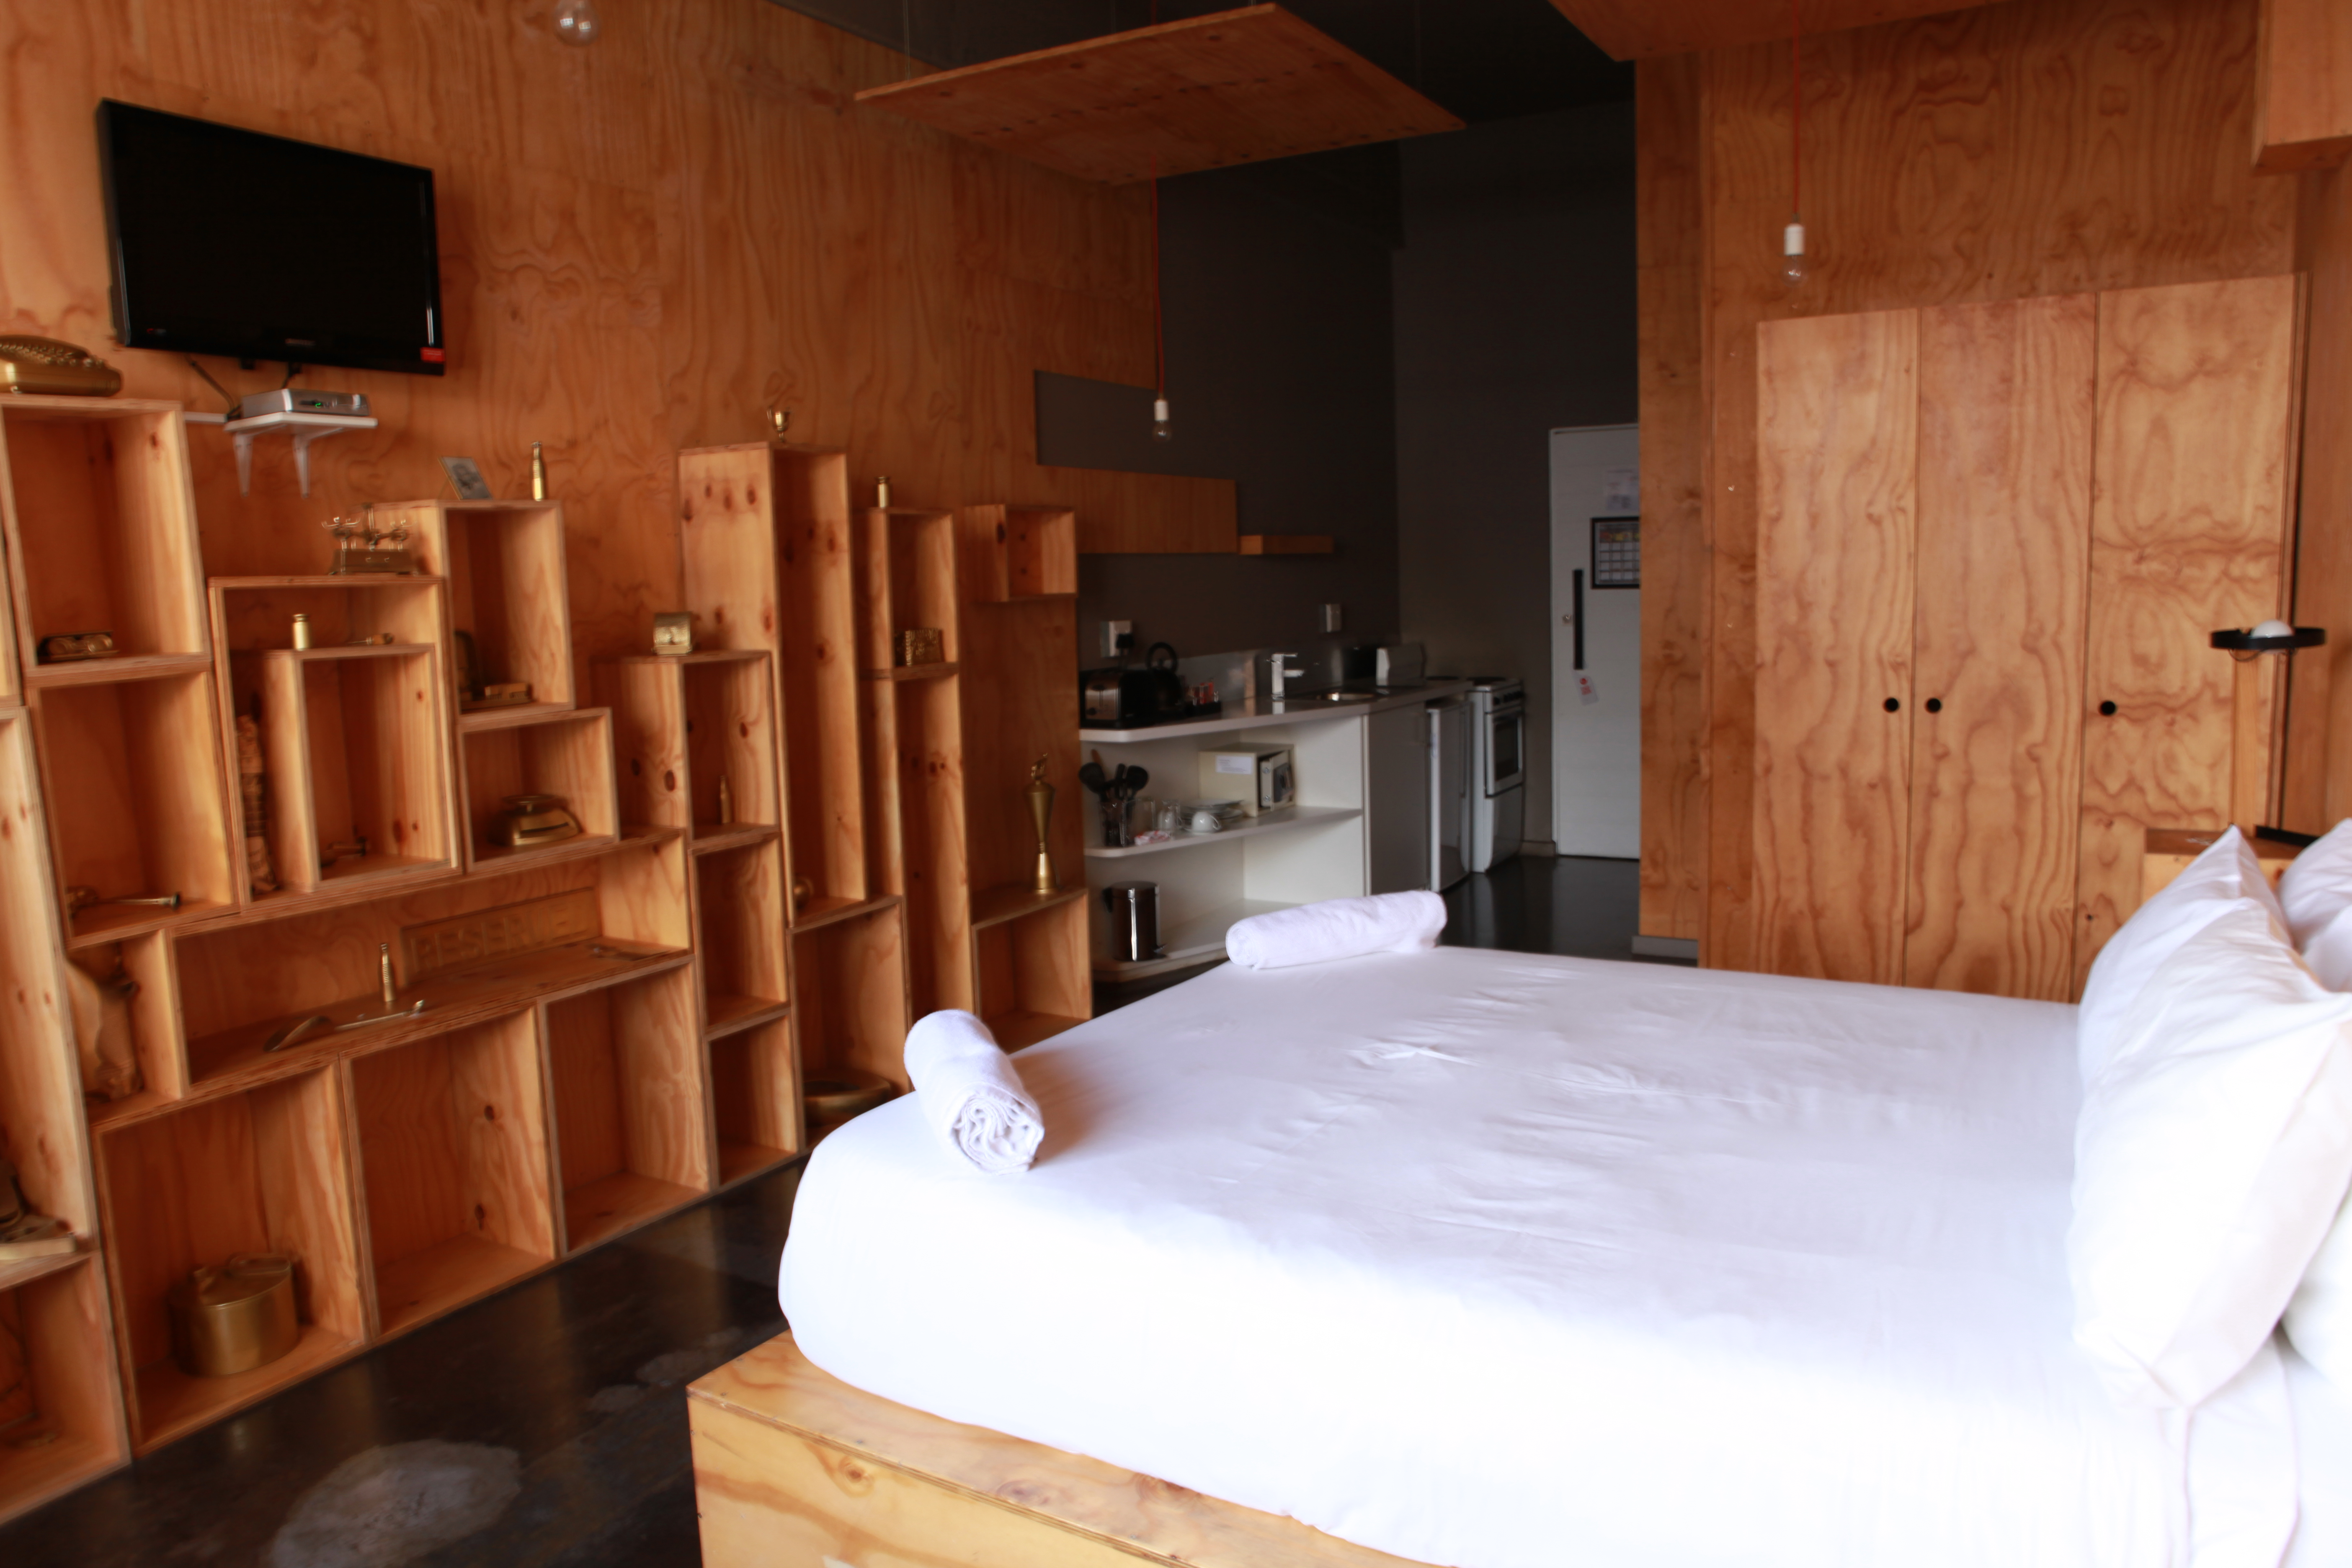 Maboneng Hotel